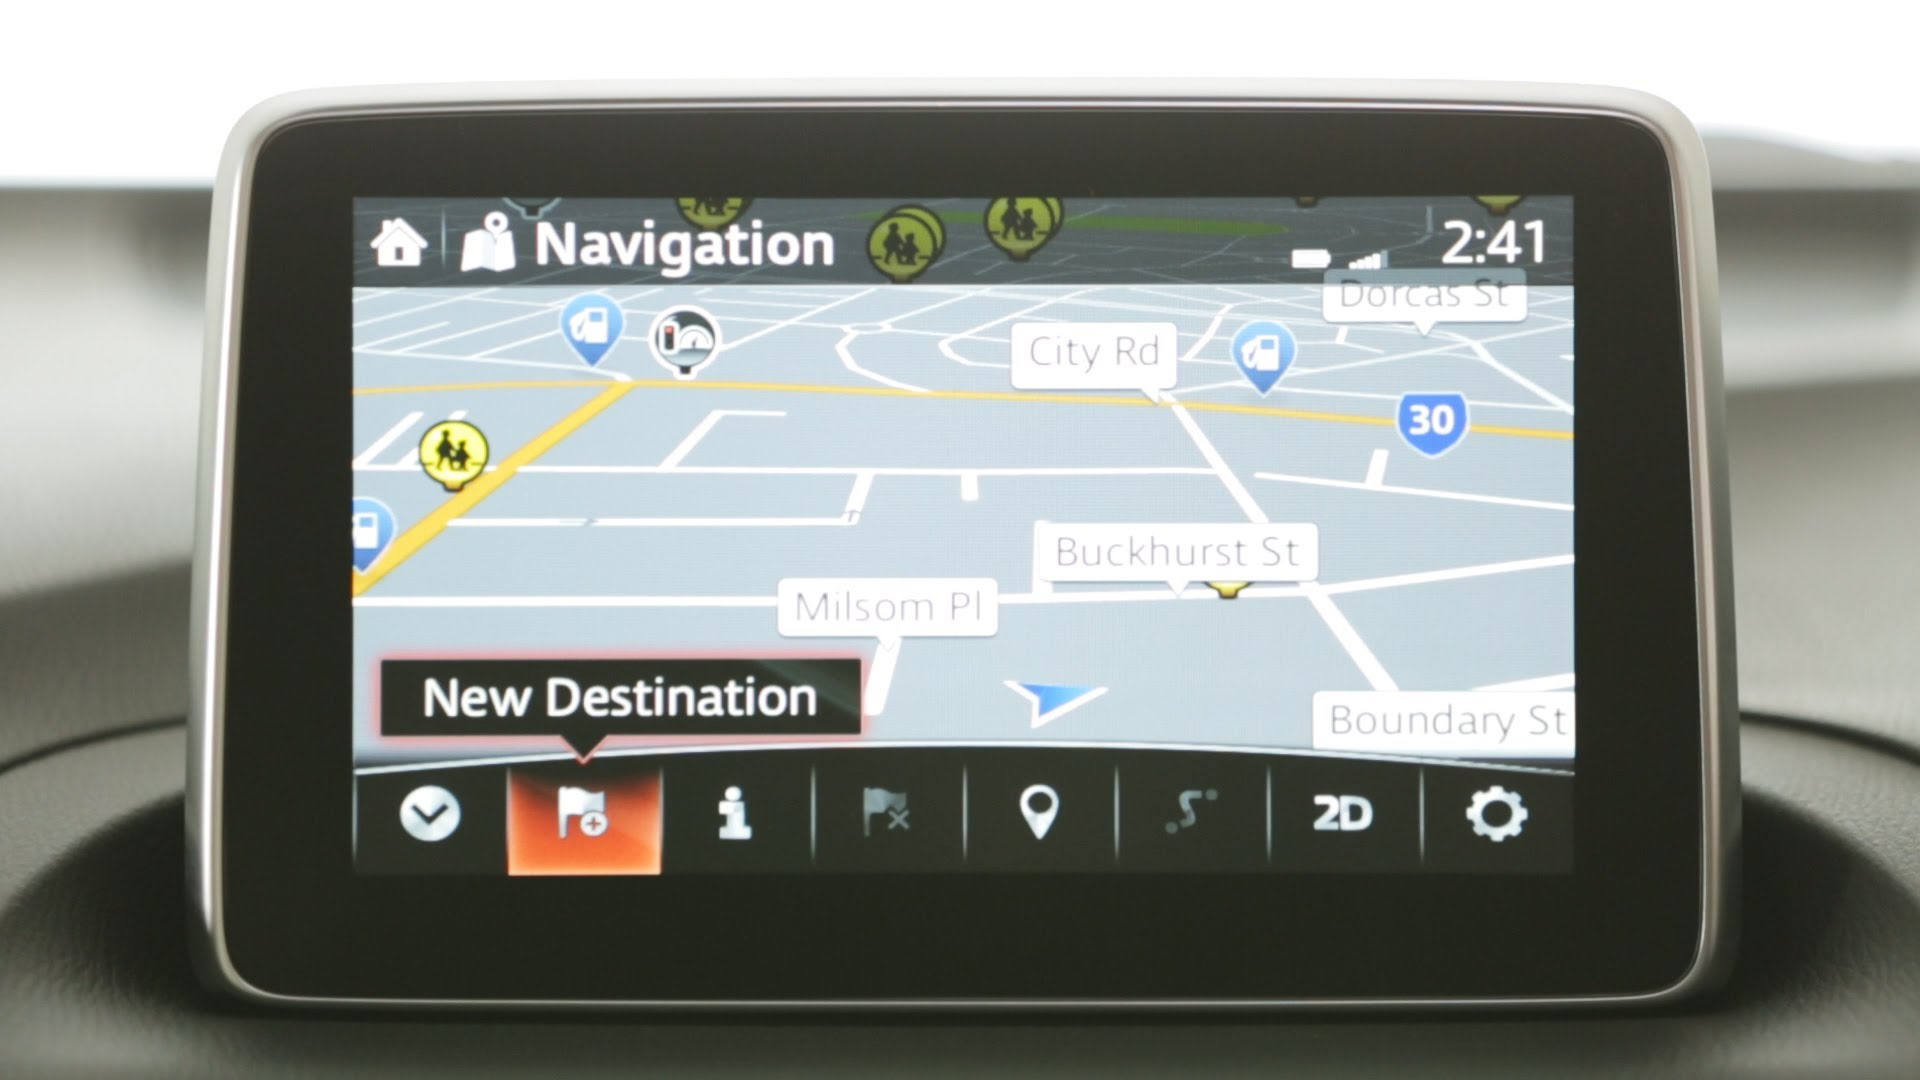 Mazda Mzd Connect Apps >> #20 — Изучаем Mazda CX-5: Навигация. Часть 2 — бортжурнал Mazda CX-5 2.5 TiT 2016 года на DRIVE2